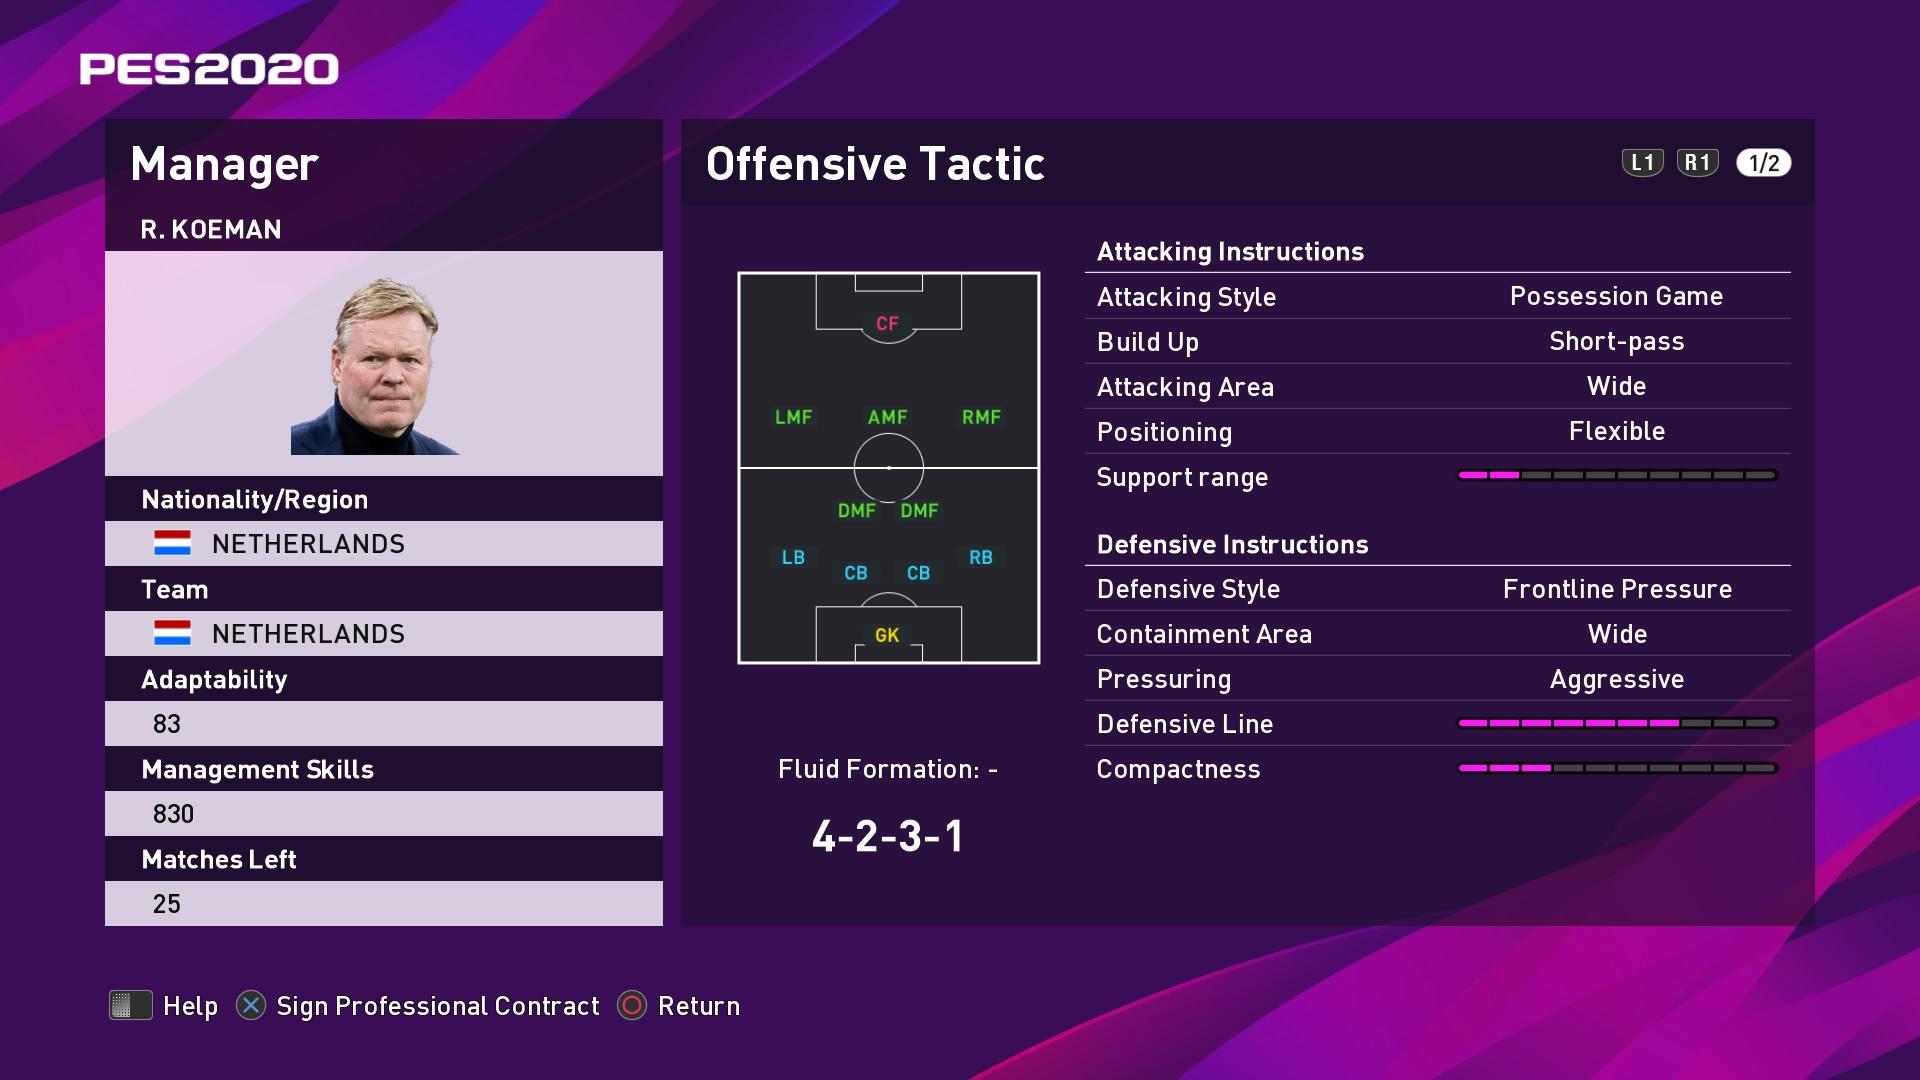 R. Koeman (3) (Ronald Koeman) Offensive Tactic in PES 2020 myClub